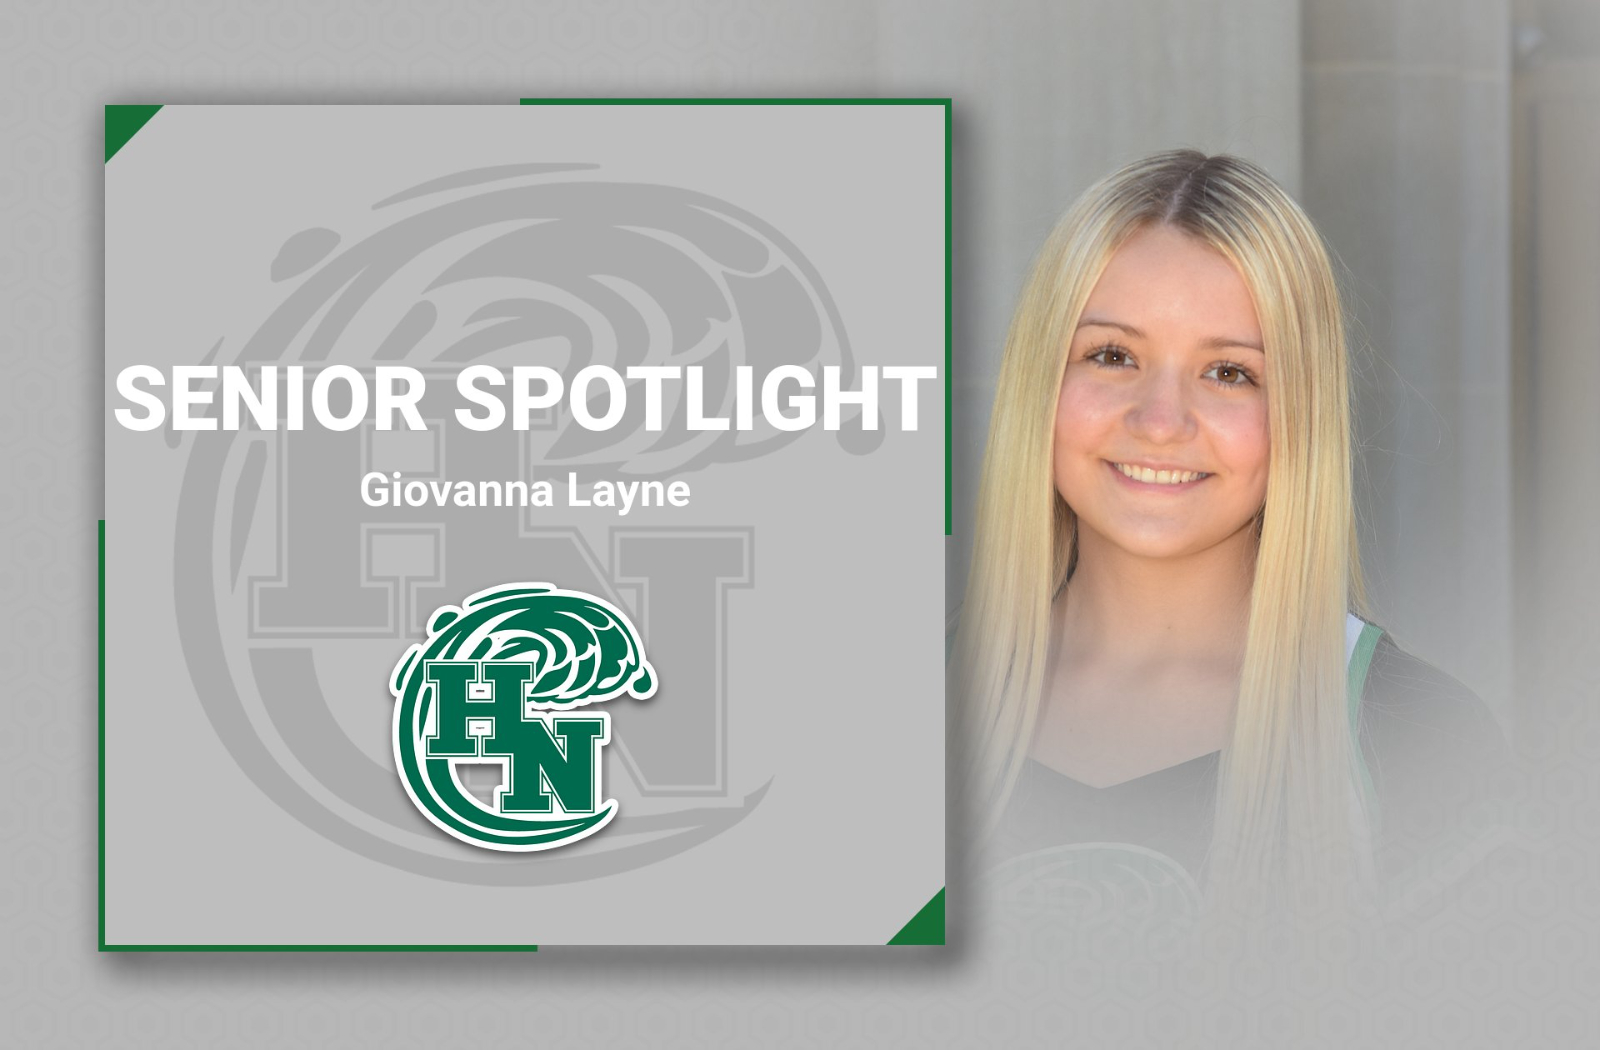 Senior Spotlight – Giovanna Layne